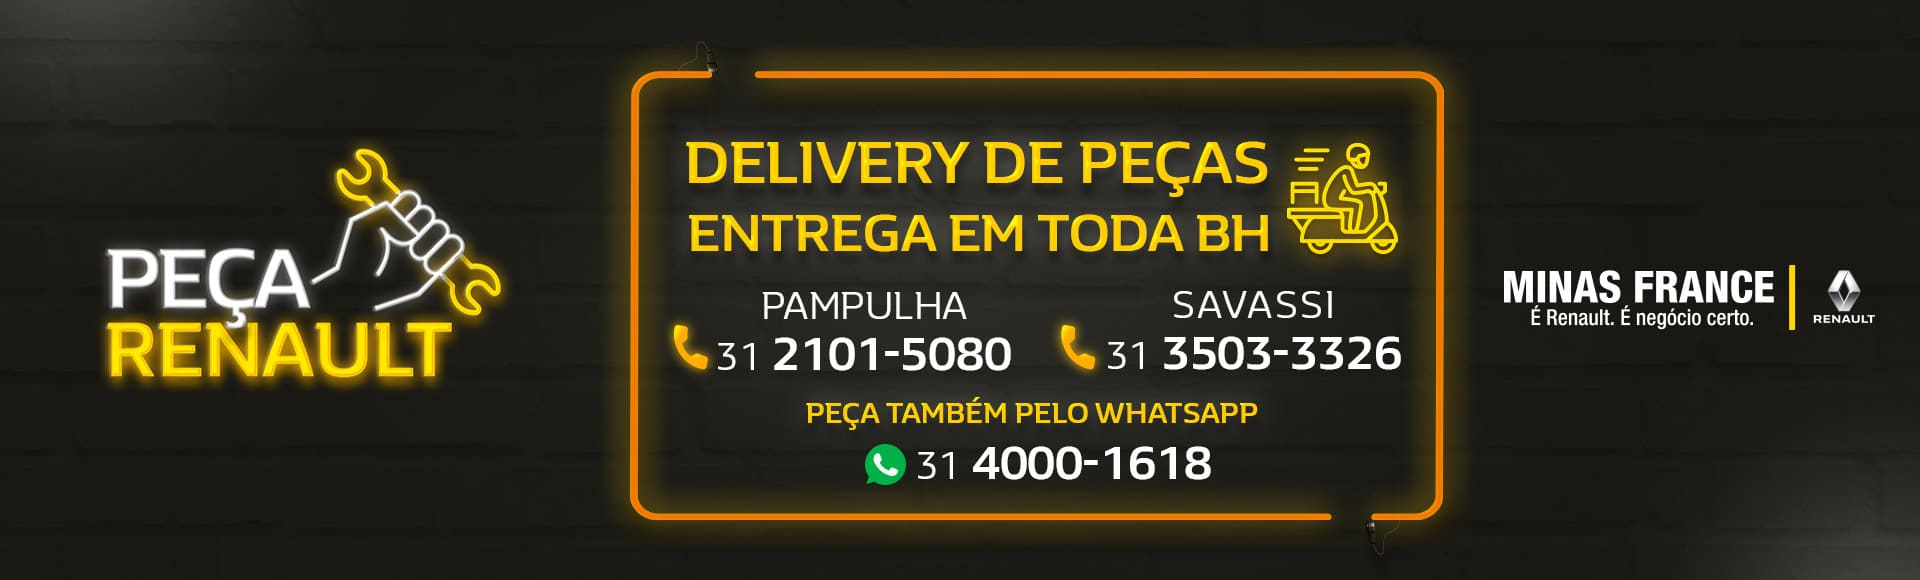 pages/minas-france-delivery-de-pecas-banner-1920x580px-80kb.jpg